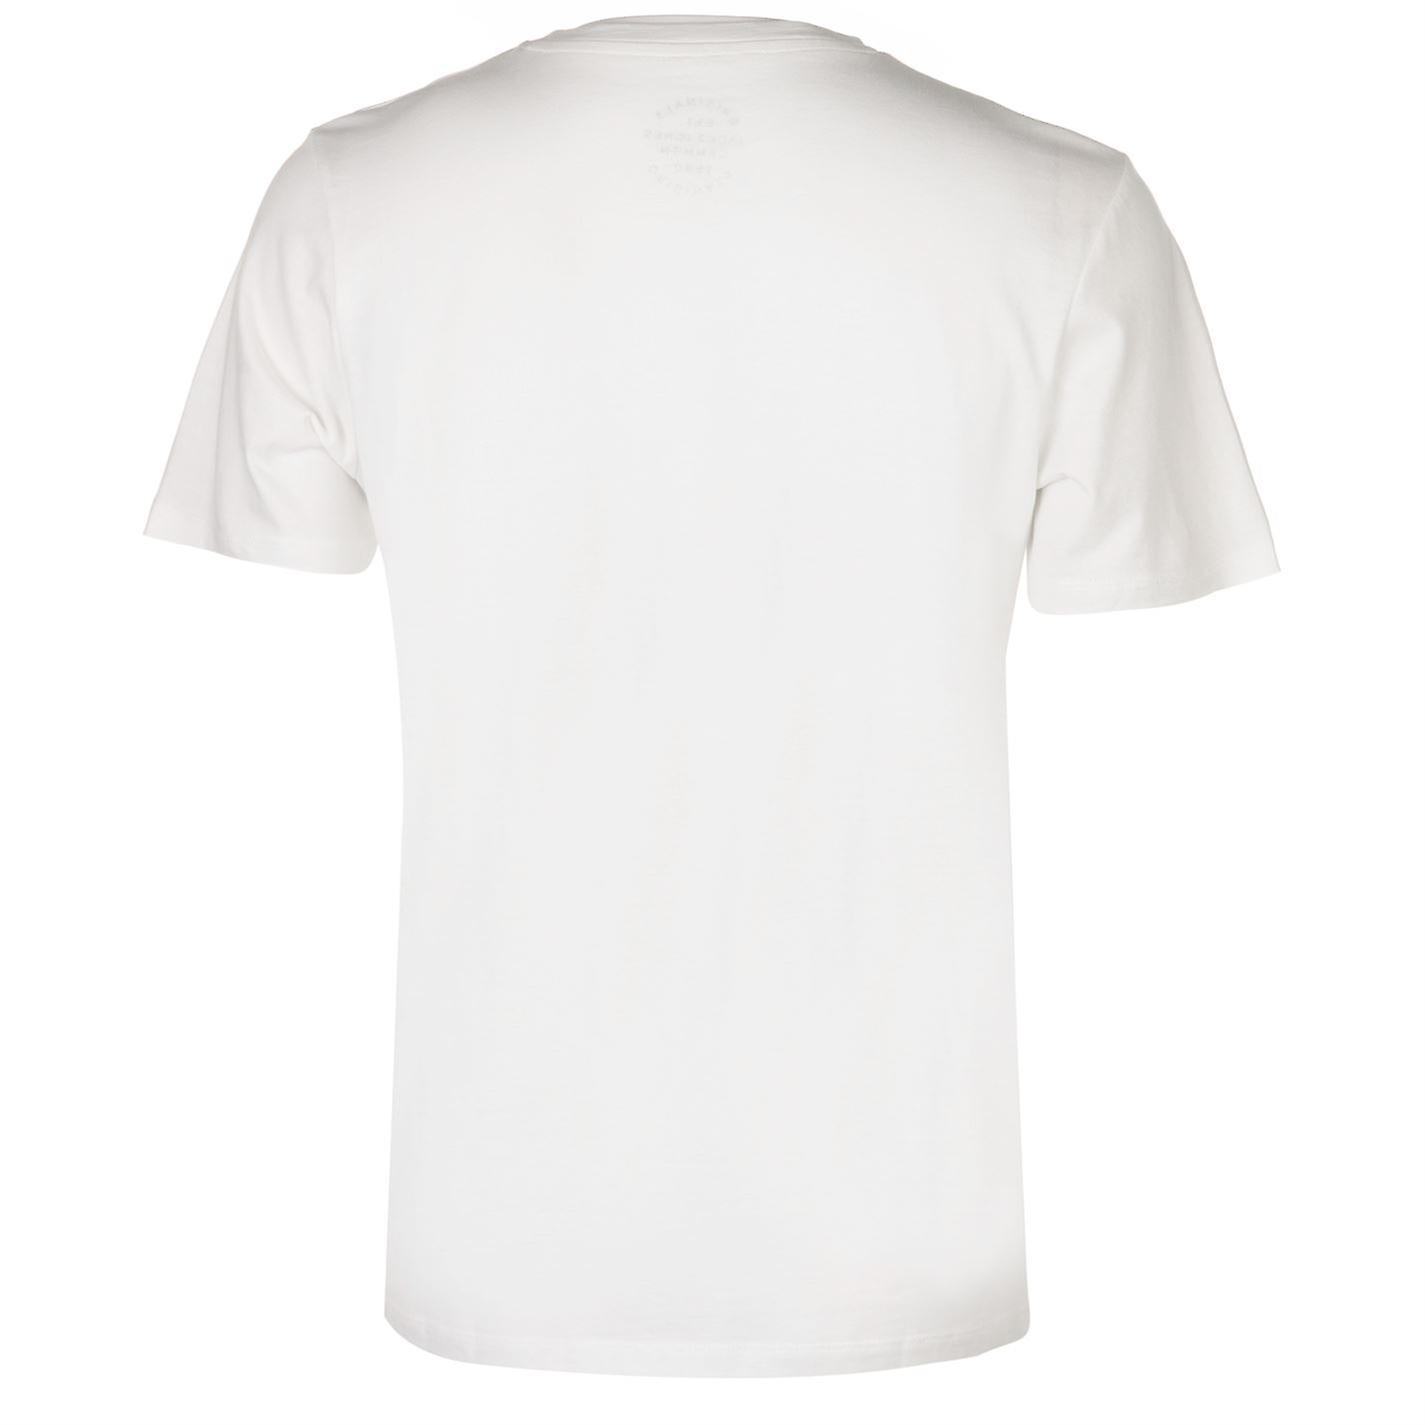 Jack and Jones Originals Jorreji T-Shirt Mens Tee Shirt Top